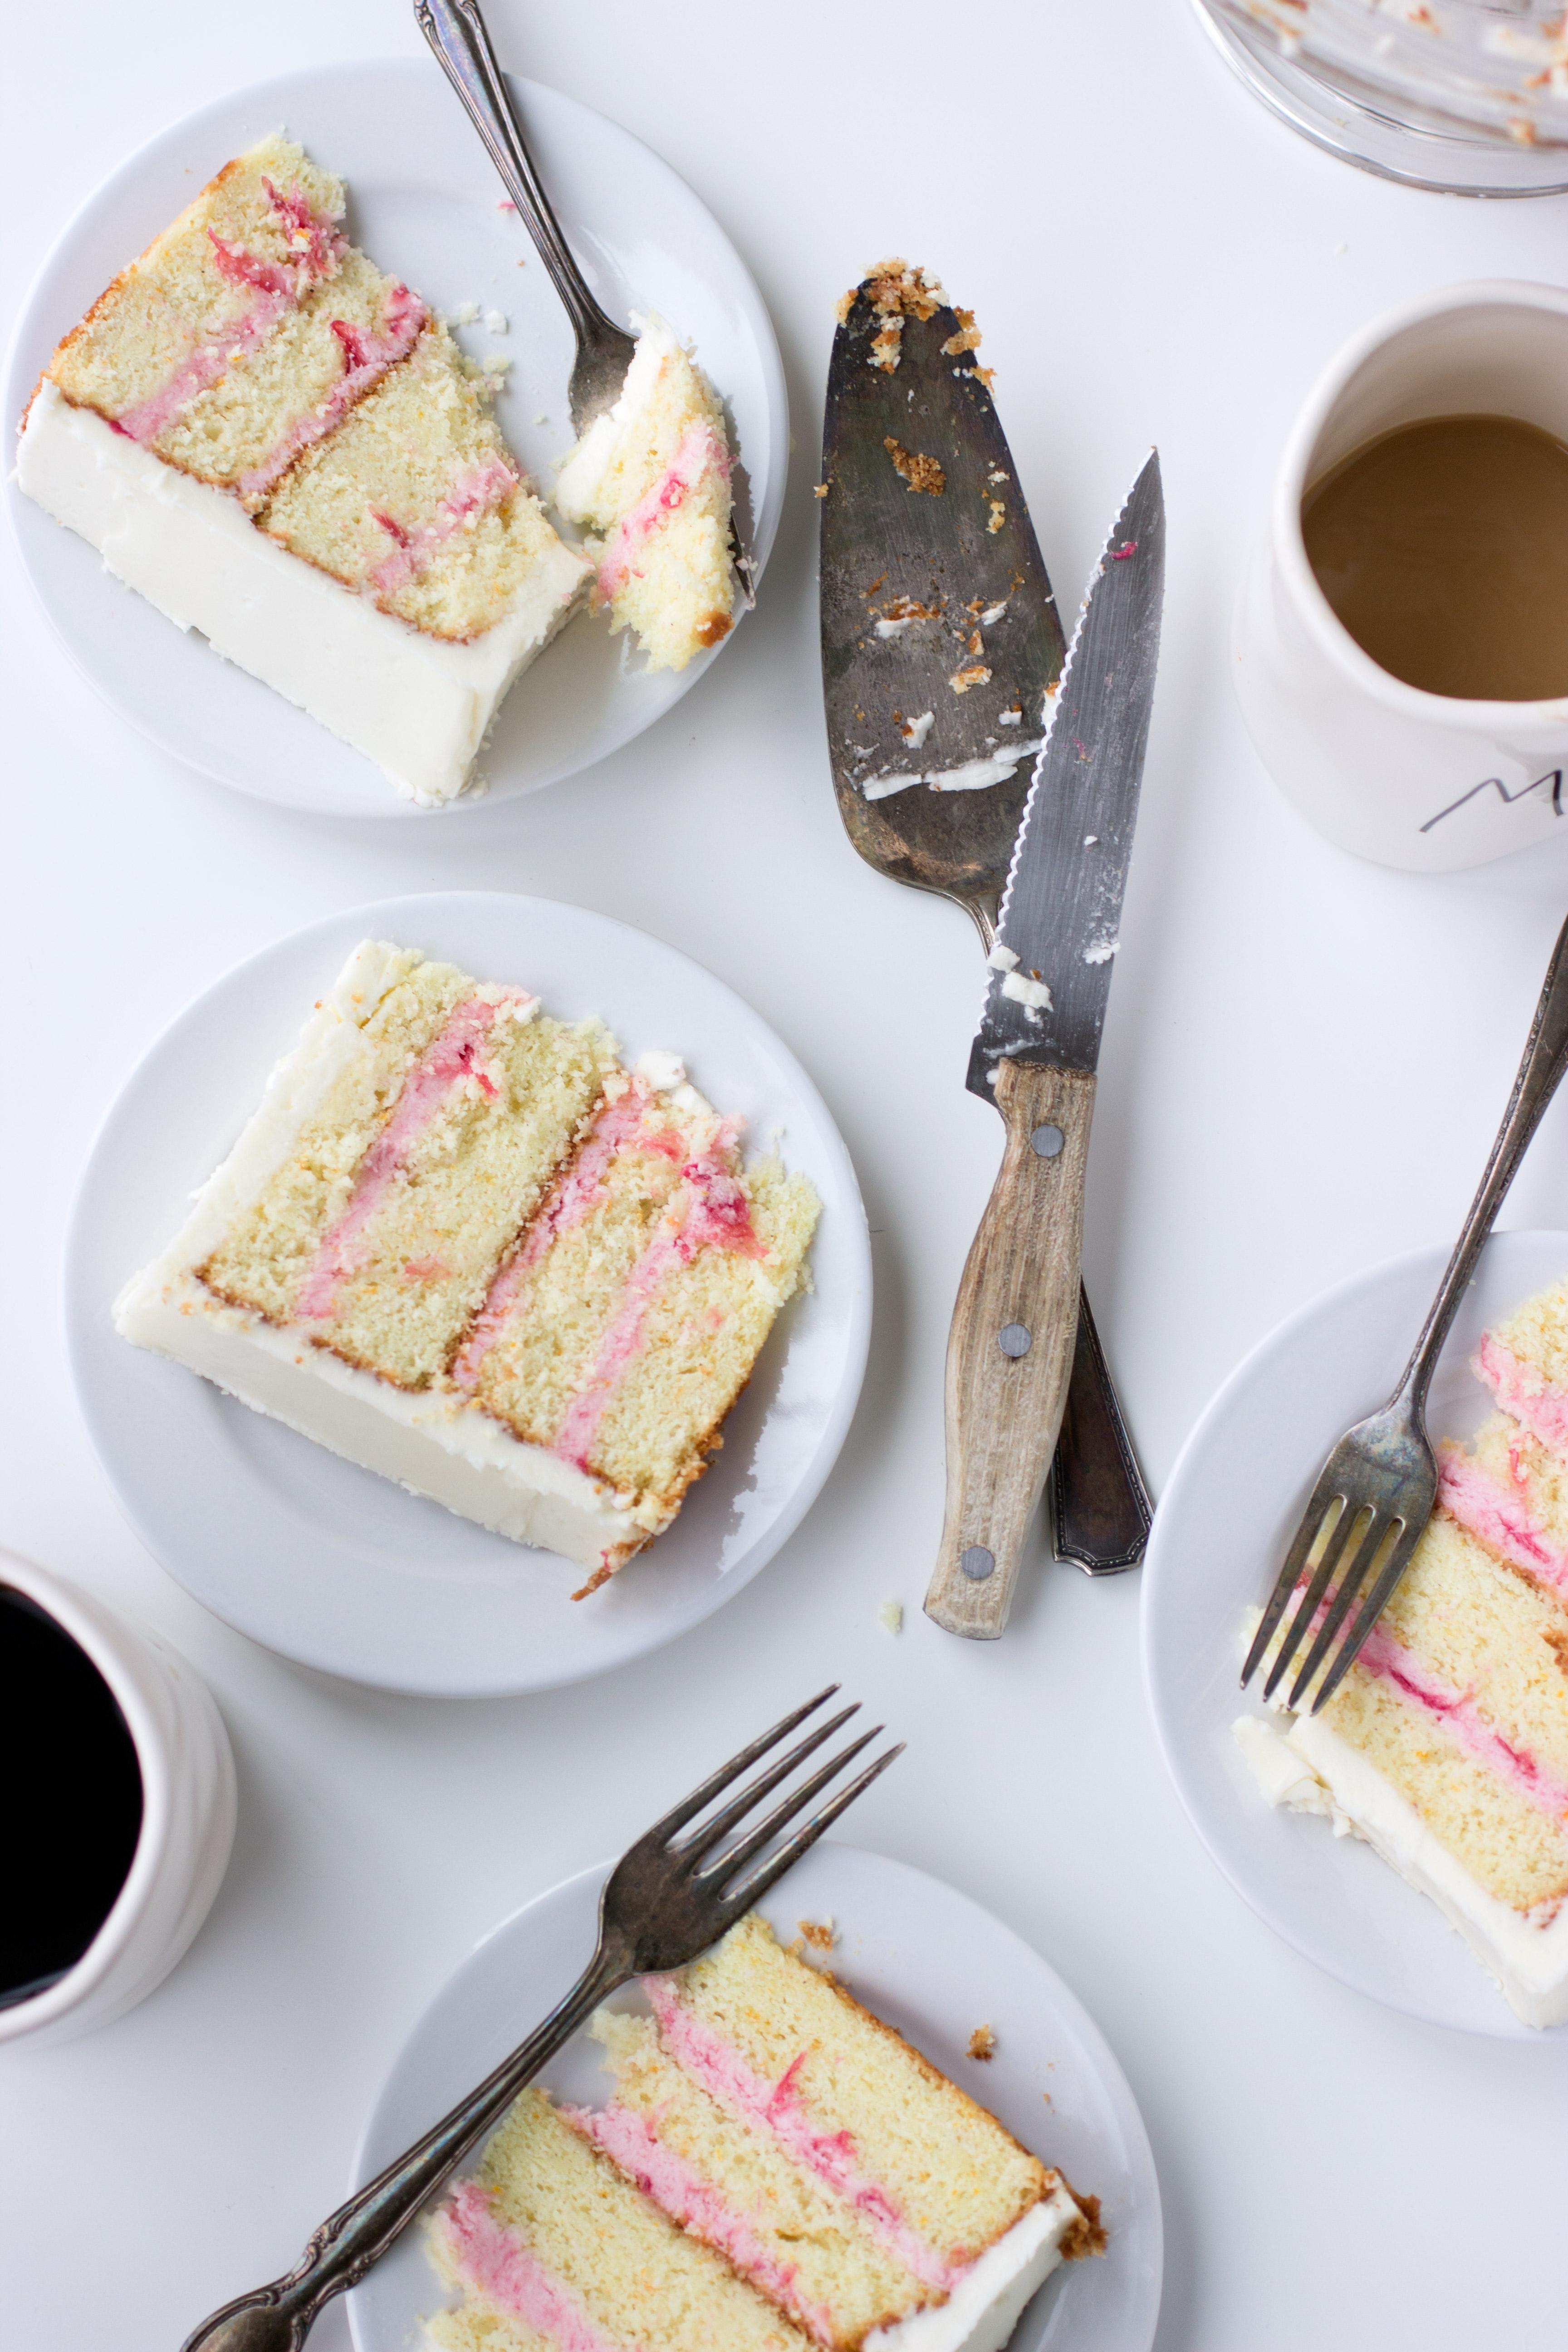 Rhubarb & Cardamom Layer Cake